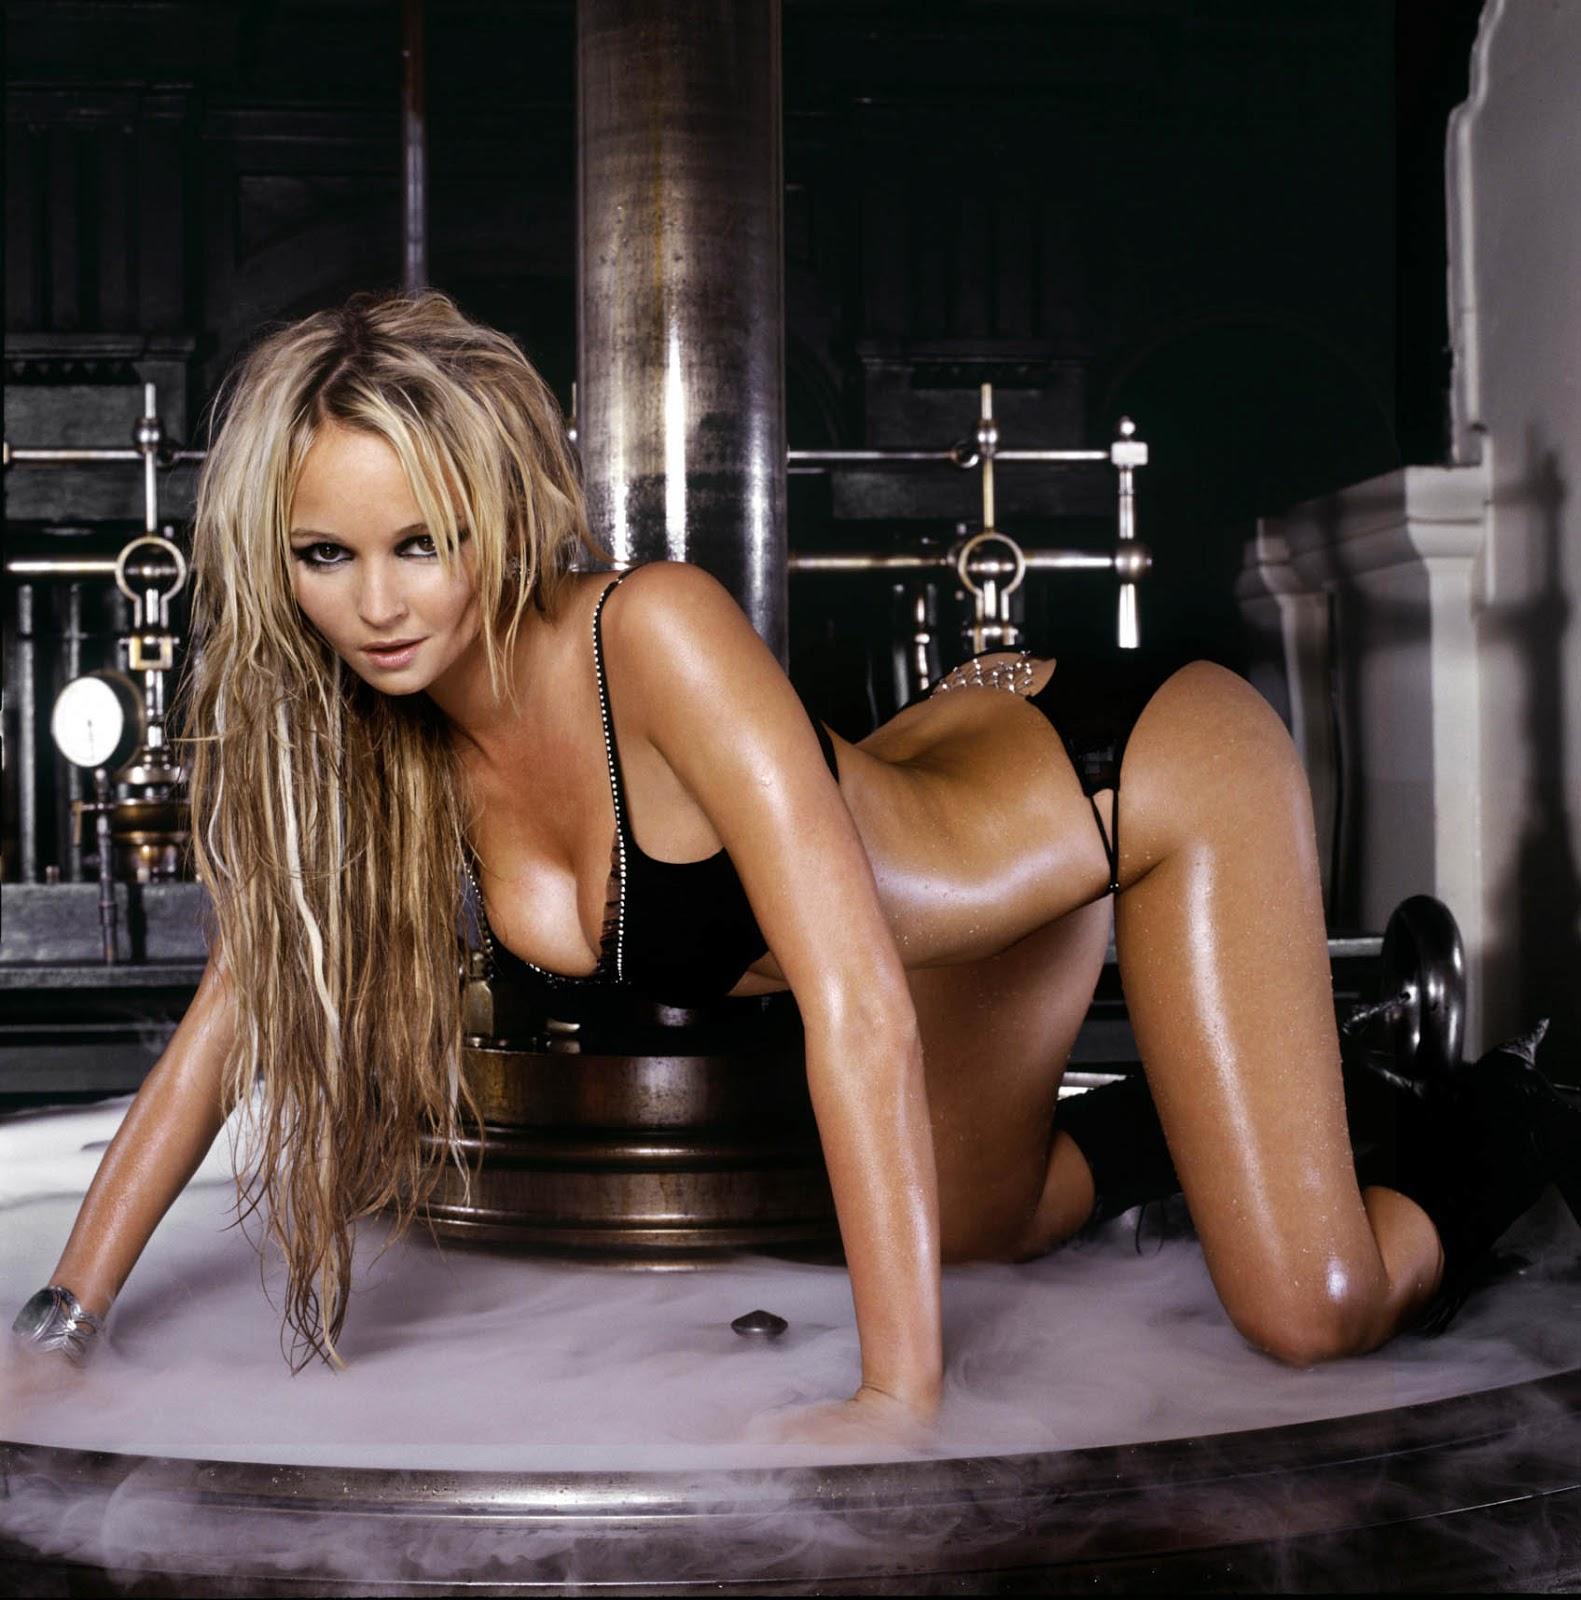 Heather wayne house of lust